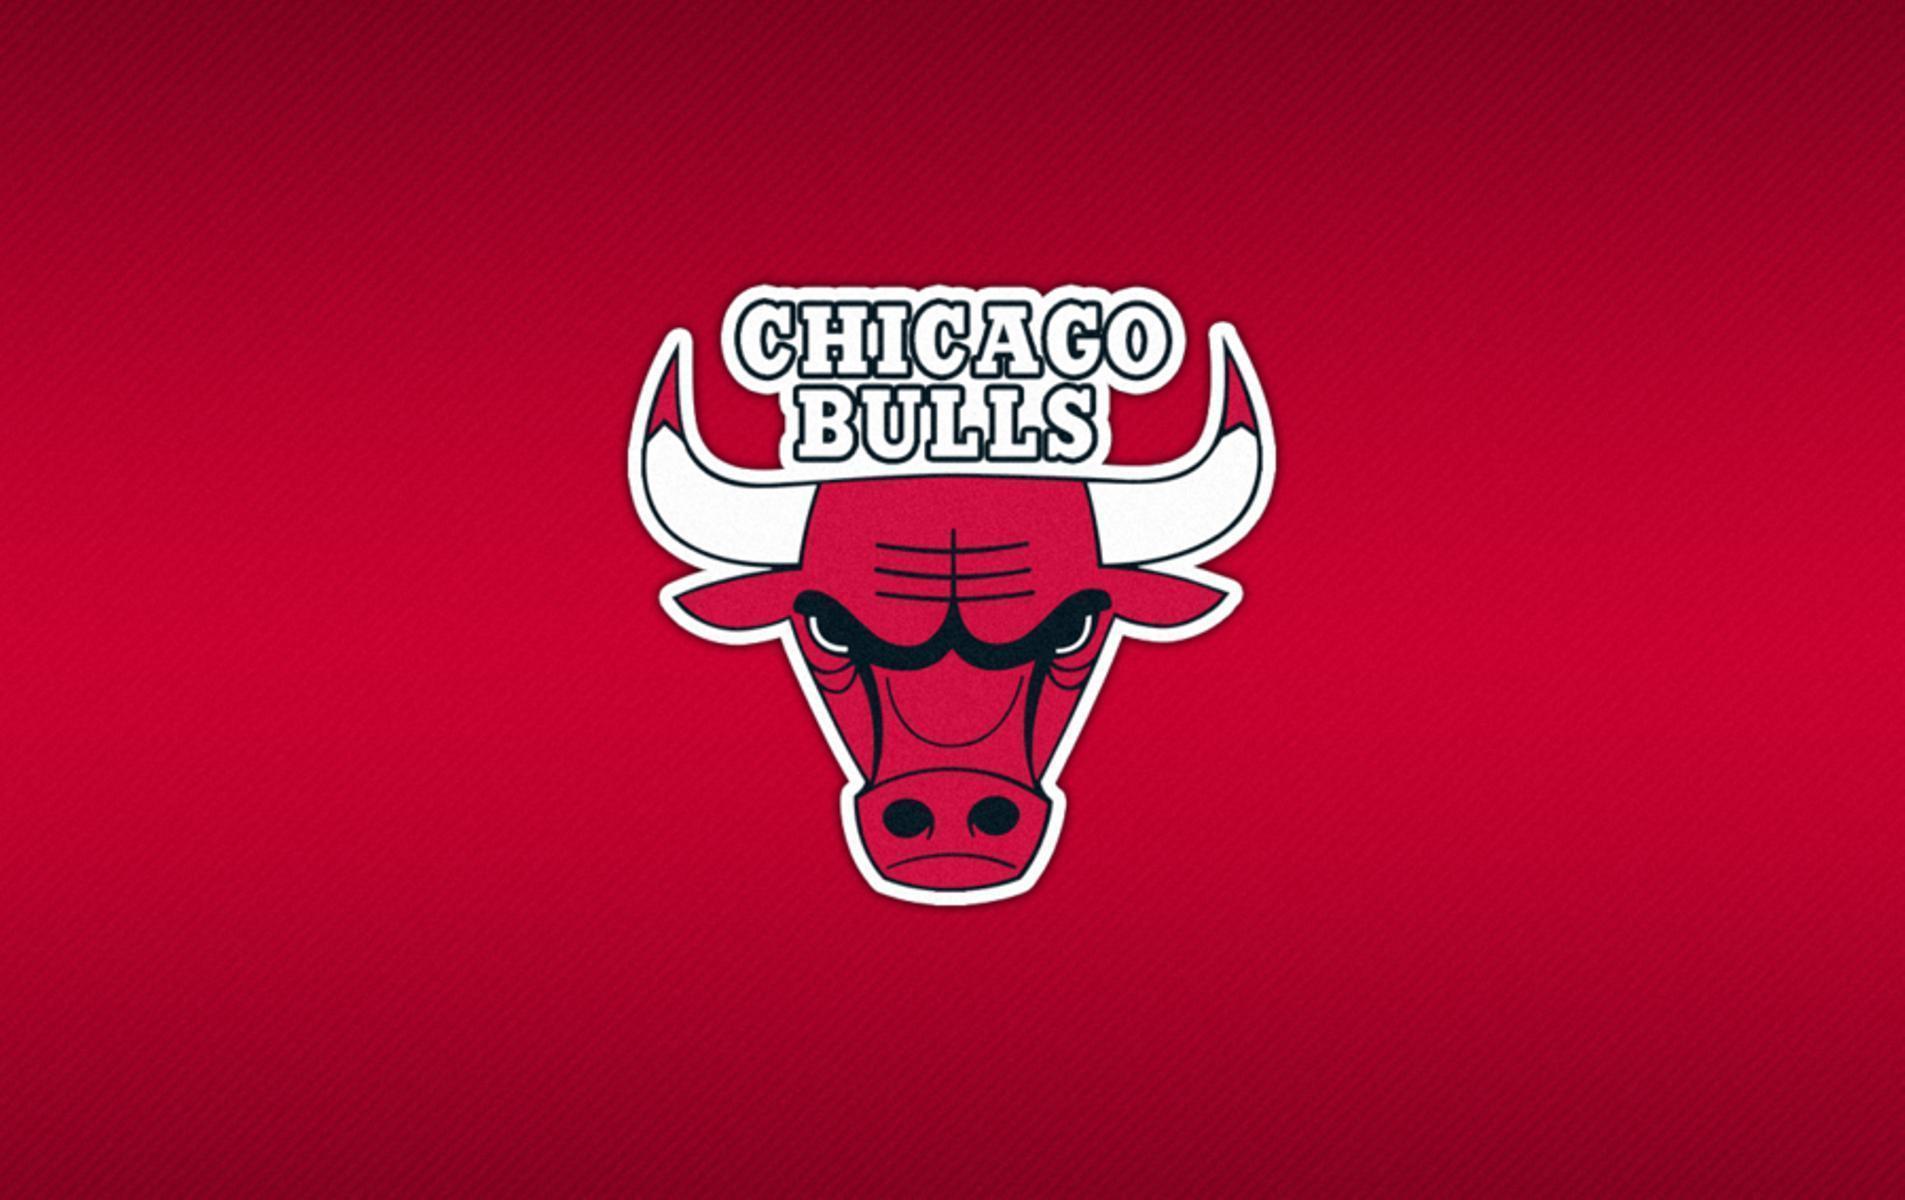 Chicago Bulls Wallpapers HD 2017 1905x1200